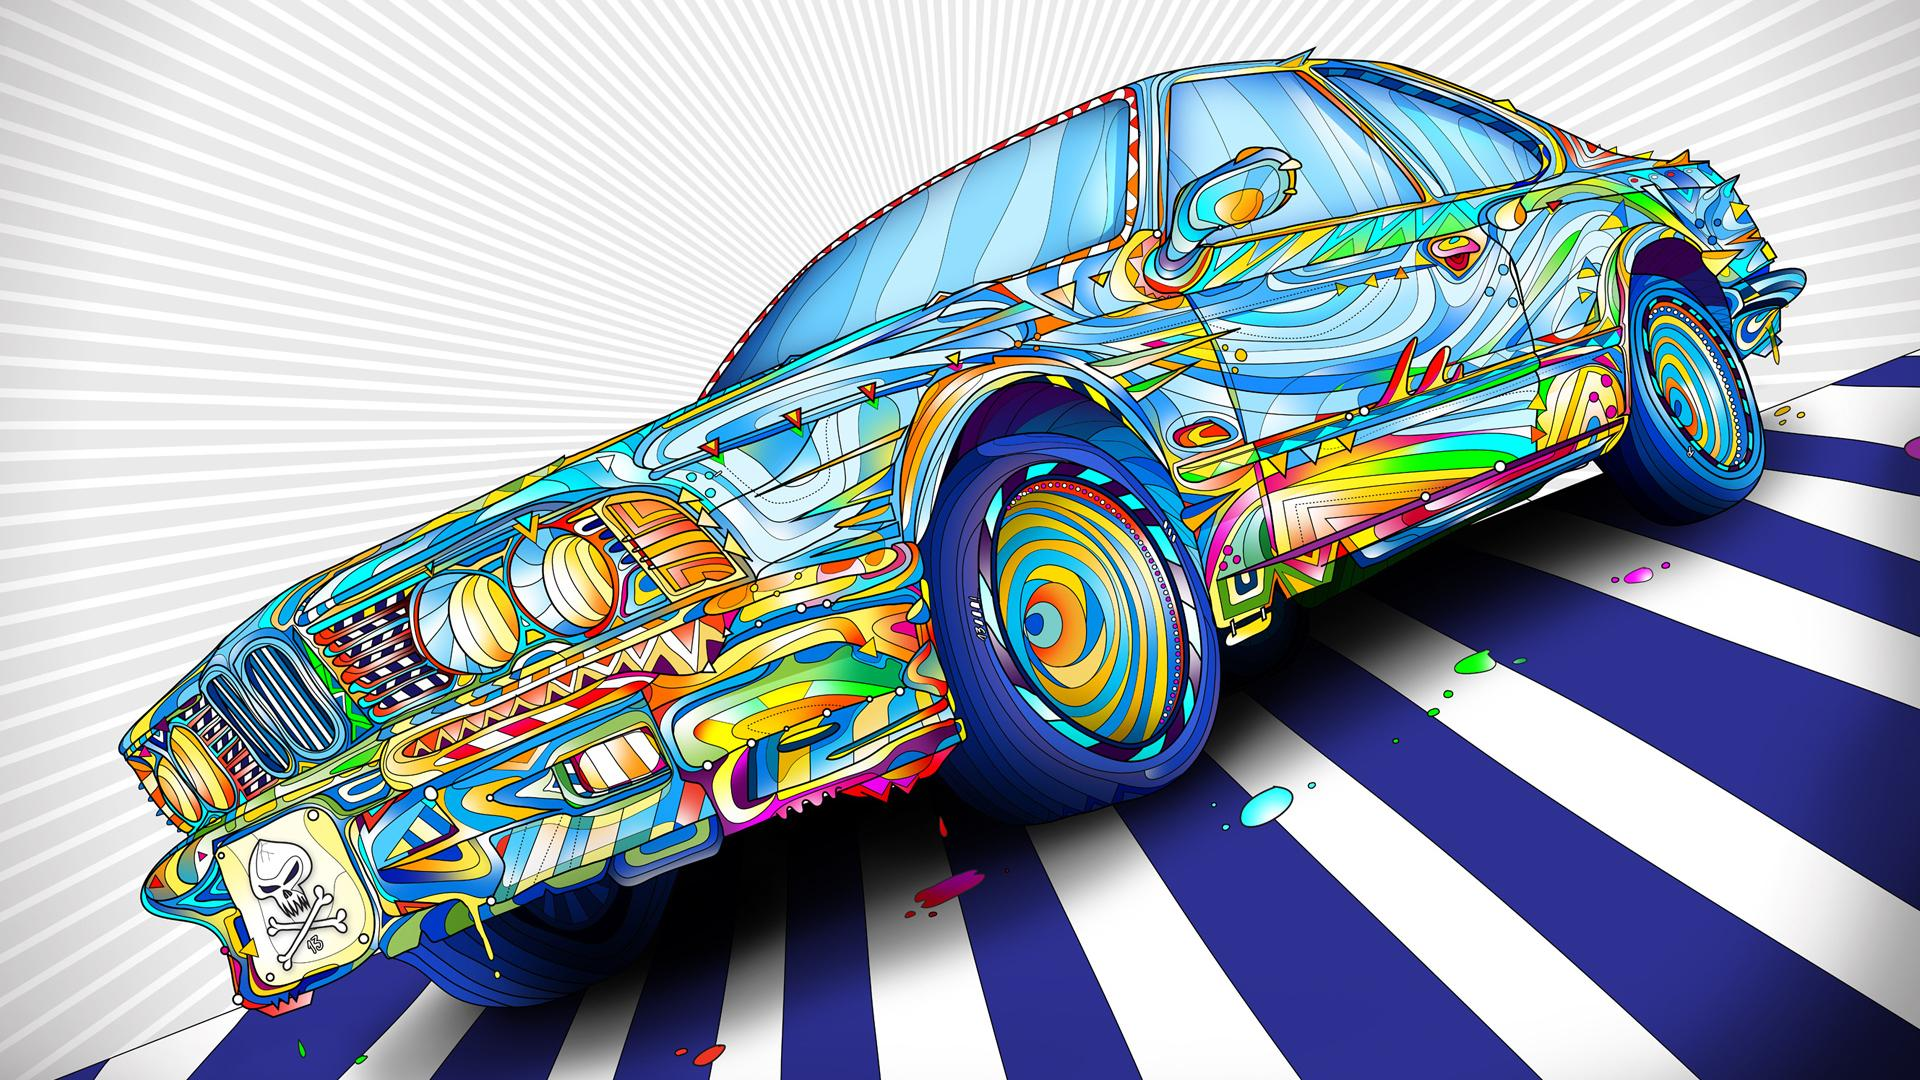 psychedelic hd wallpaper widescreen 1920x1080